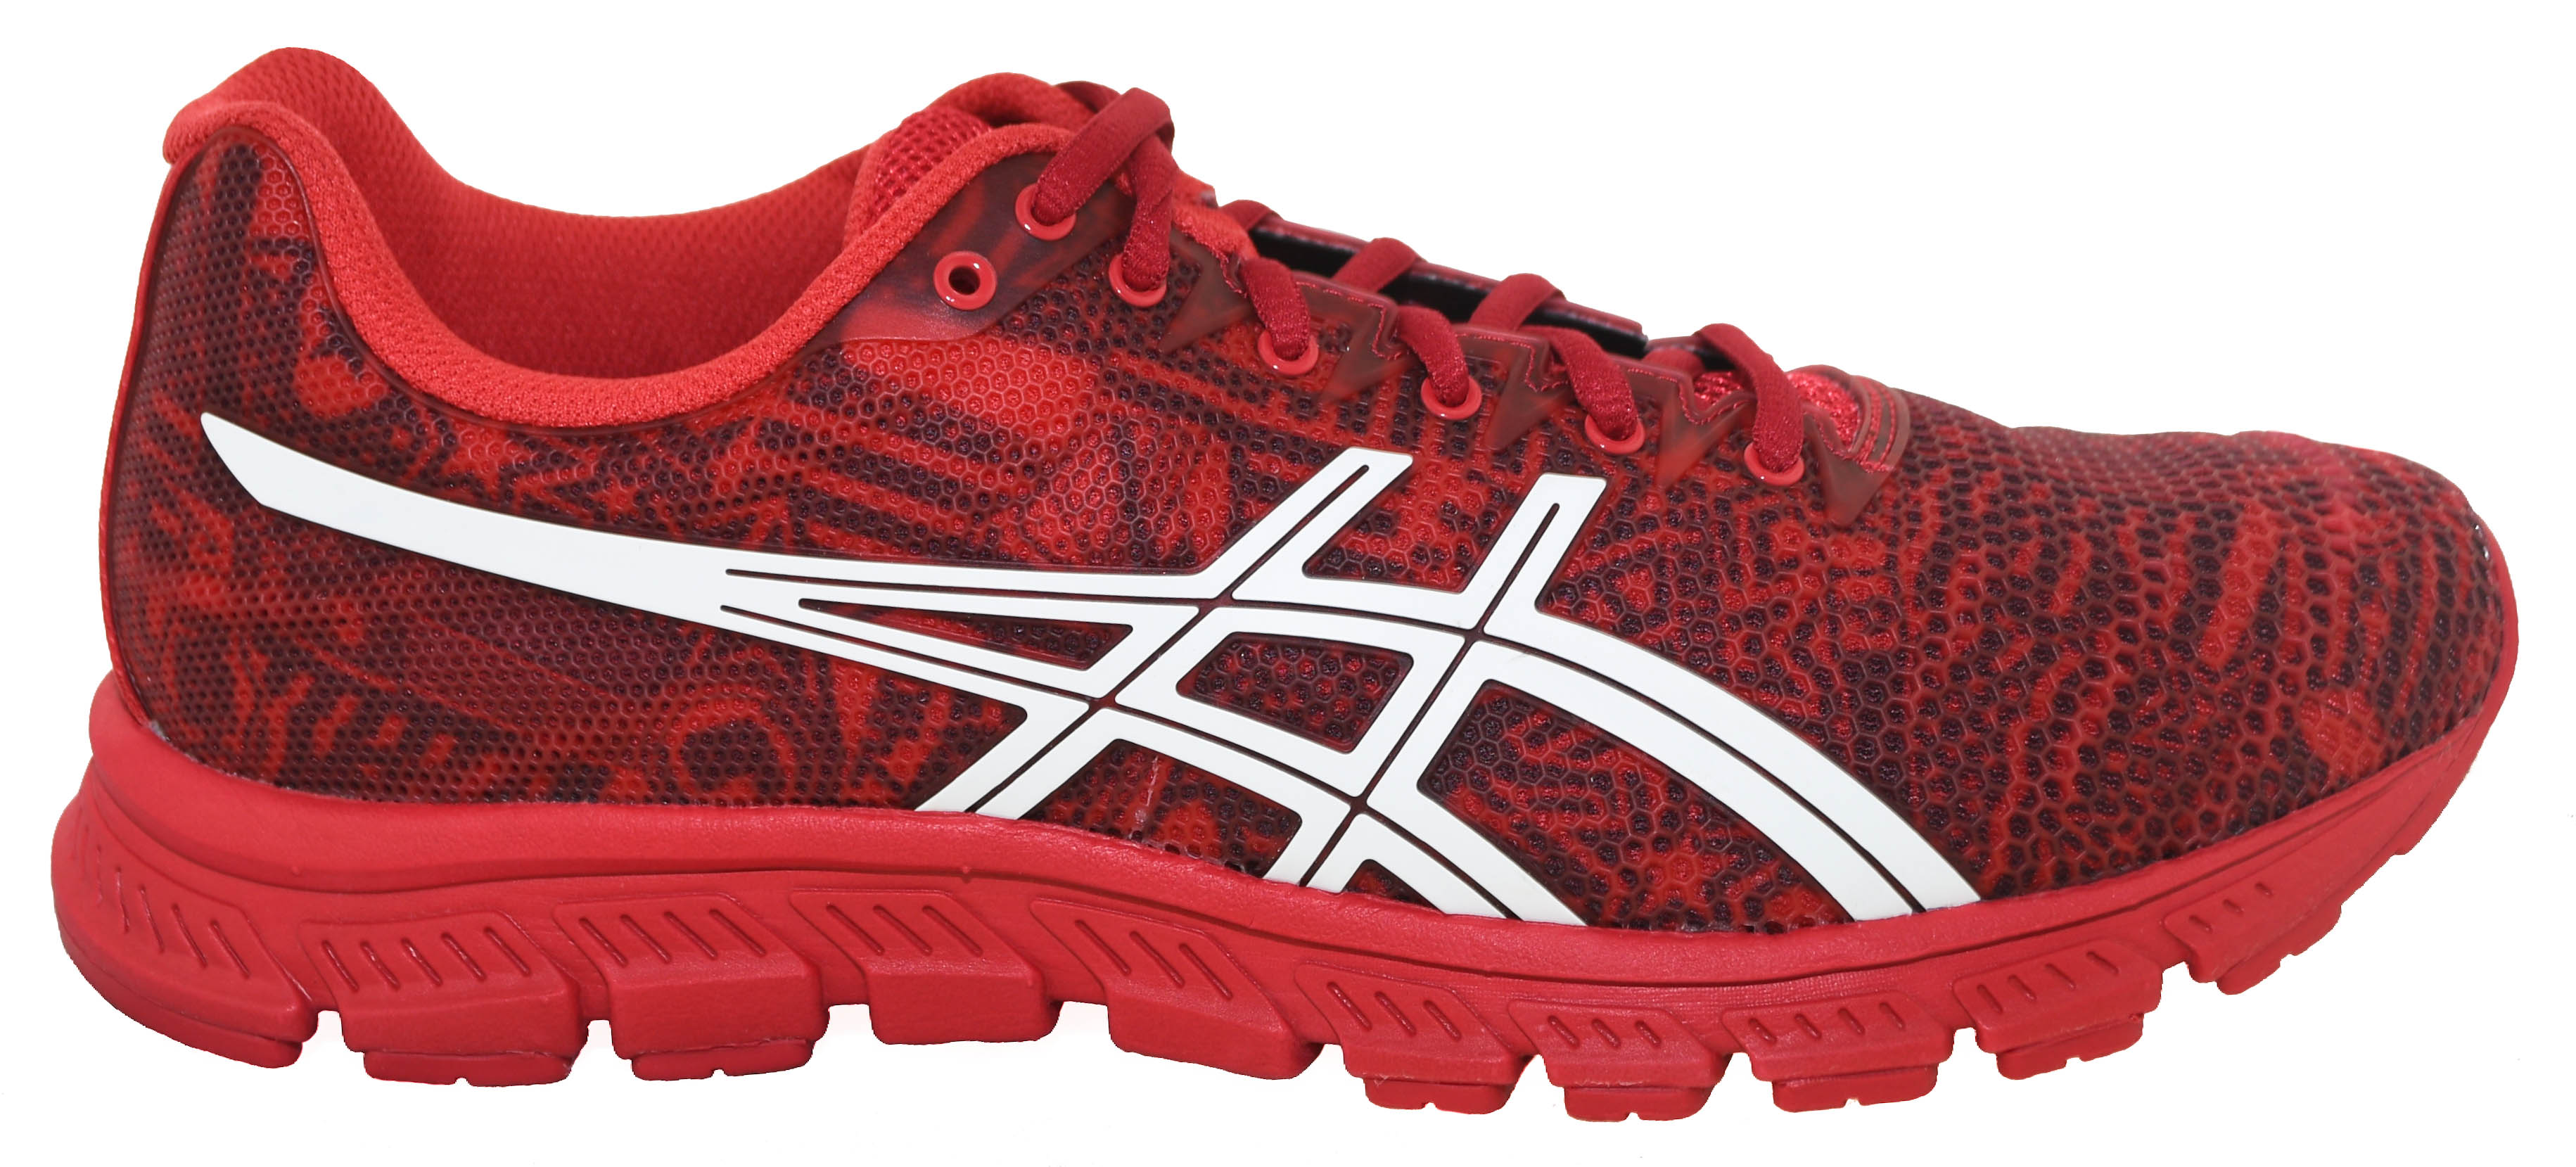 c5040ca1715c Asics Mens JB Elite TR Training Shoes Red White Crimson